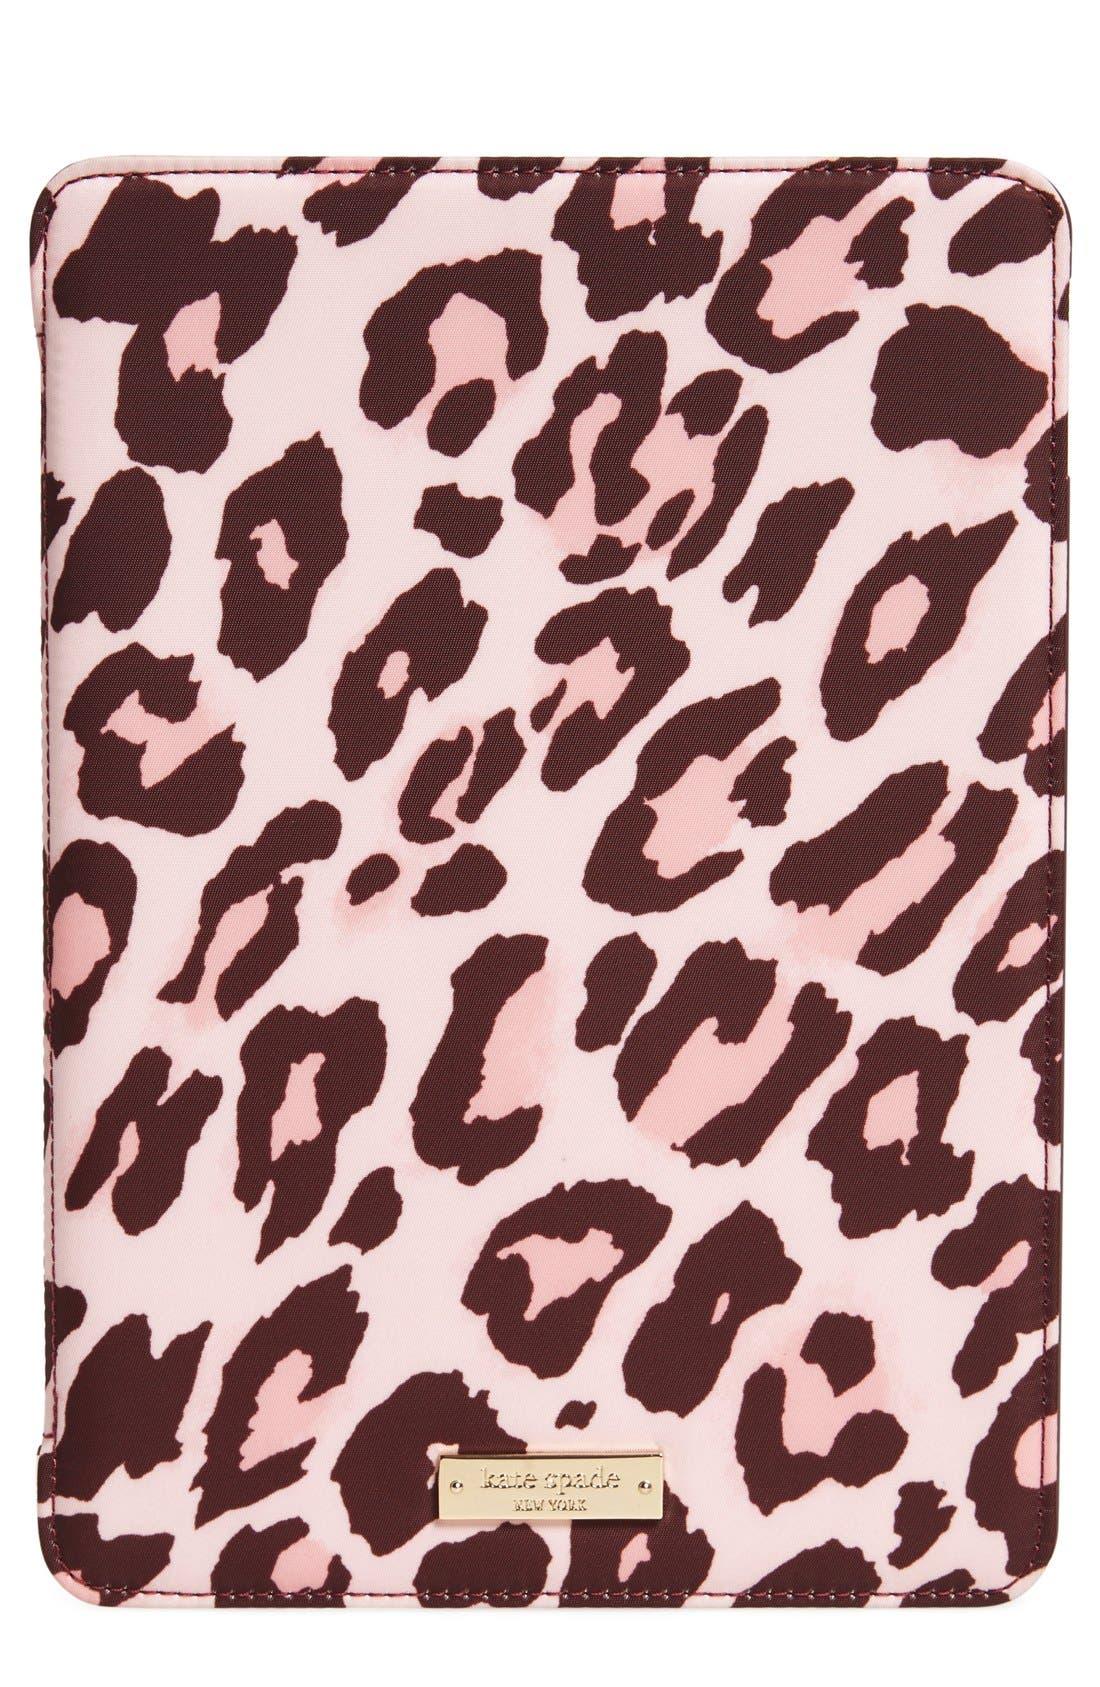 KATE SPADE NEW YORK leopard print iPad Air 2 hardcase folio, Main, color, 650